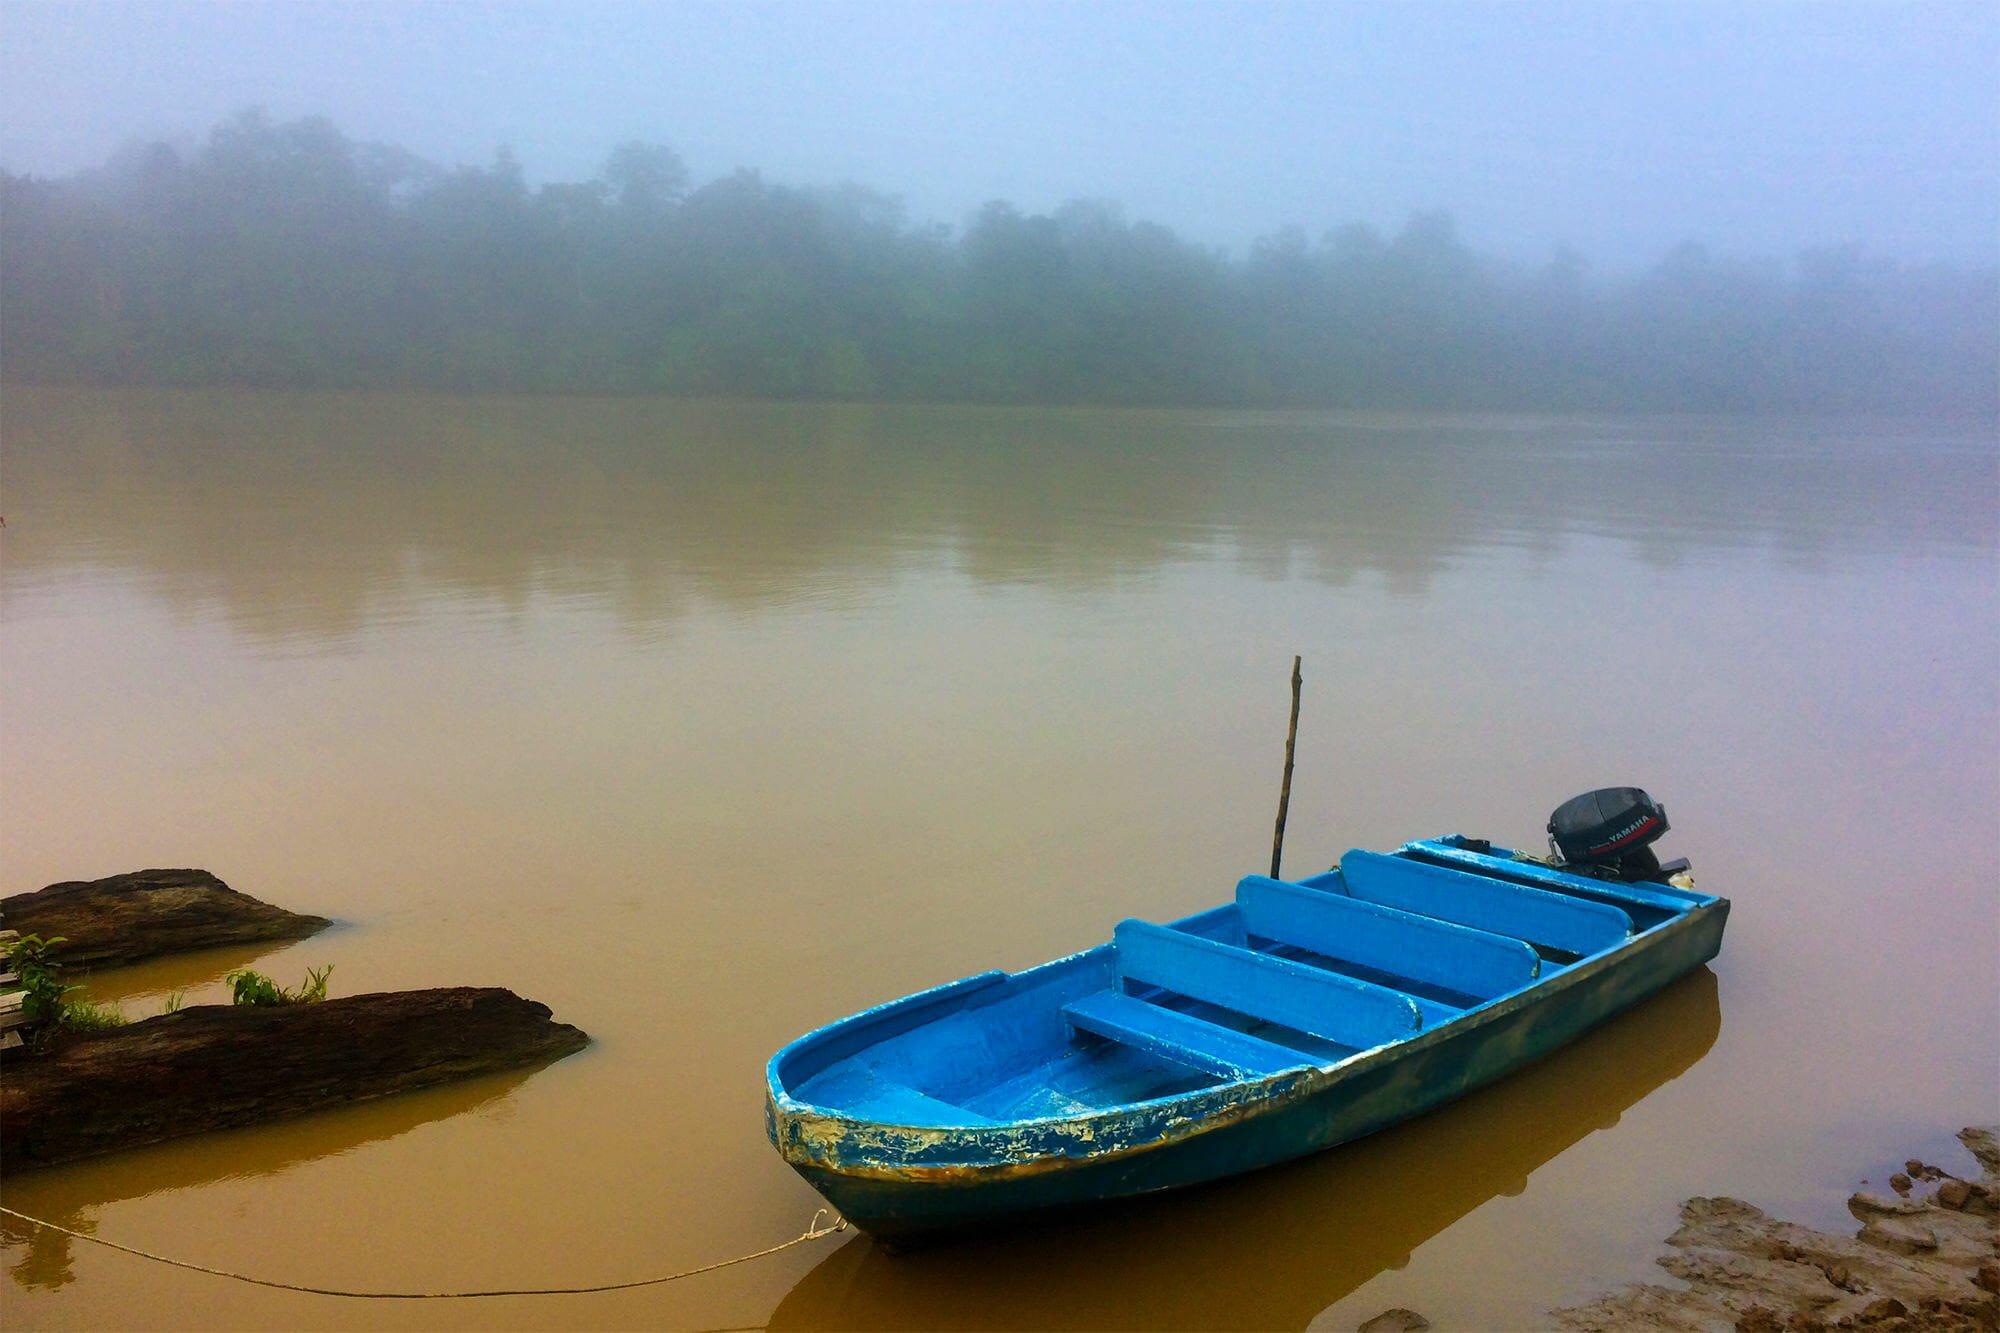 Morning mist lifting off Kinabatangan River, Borneo